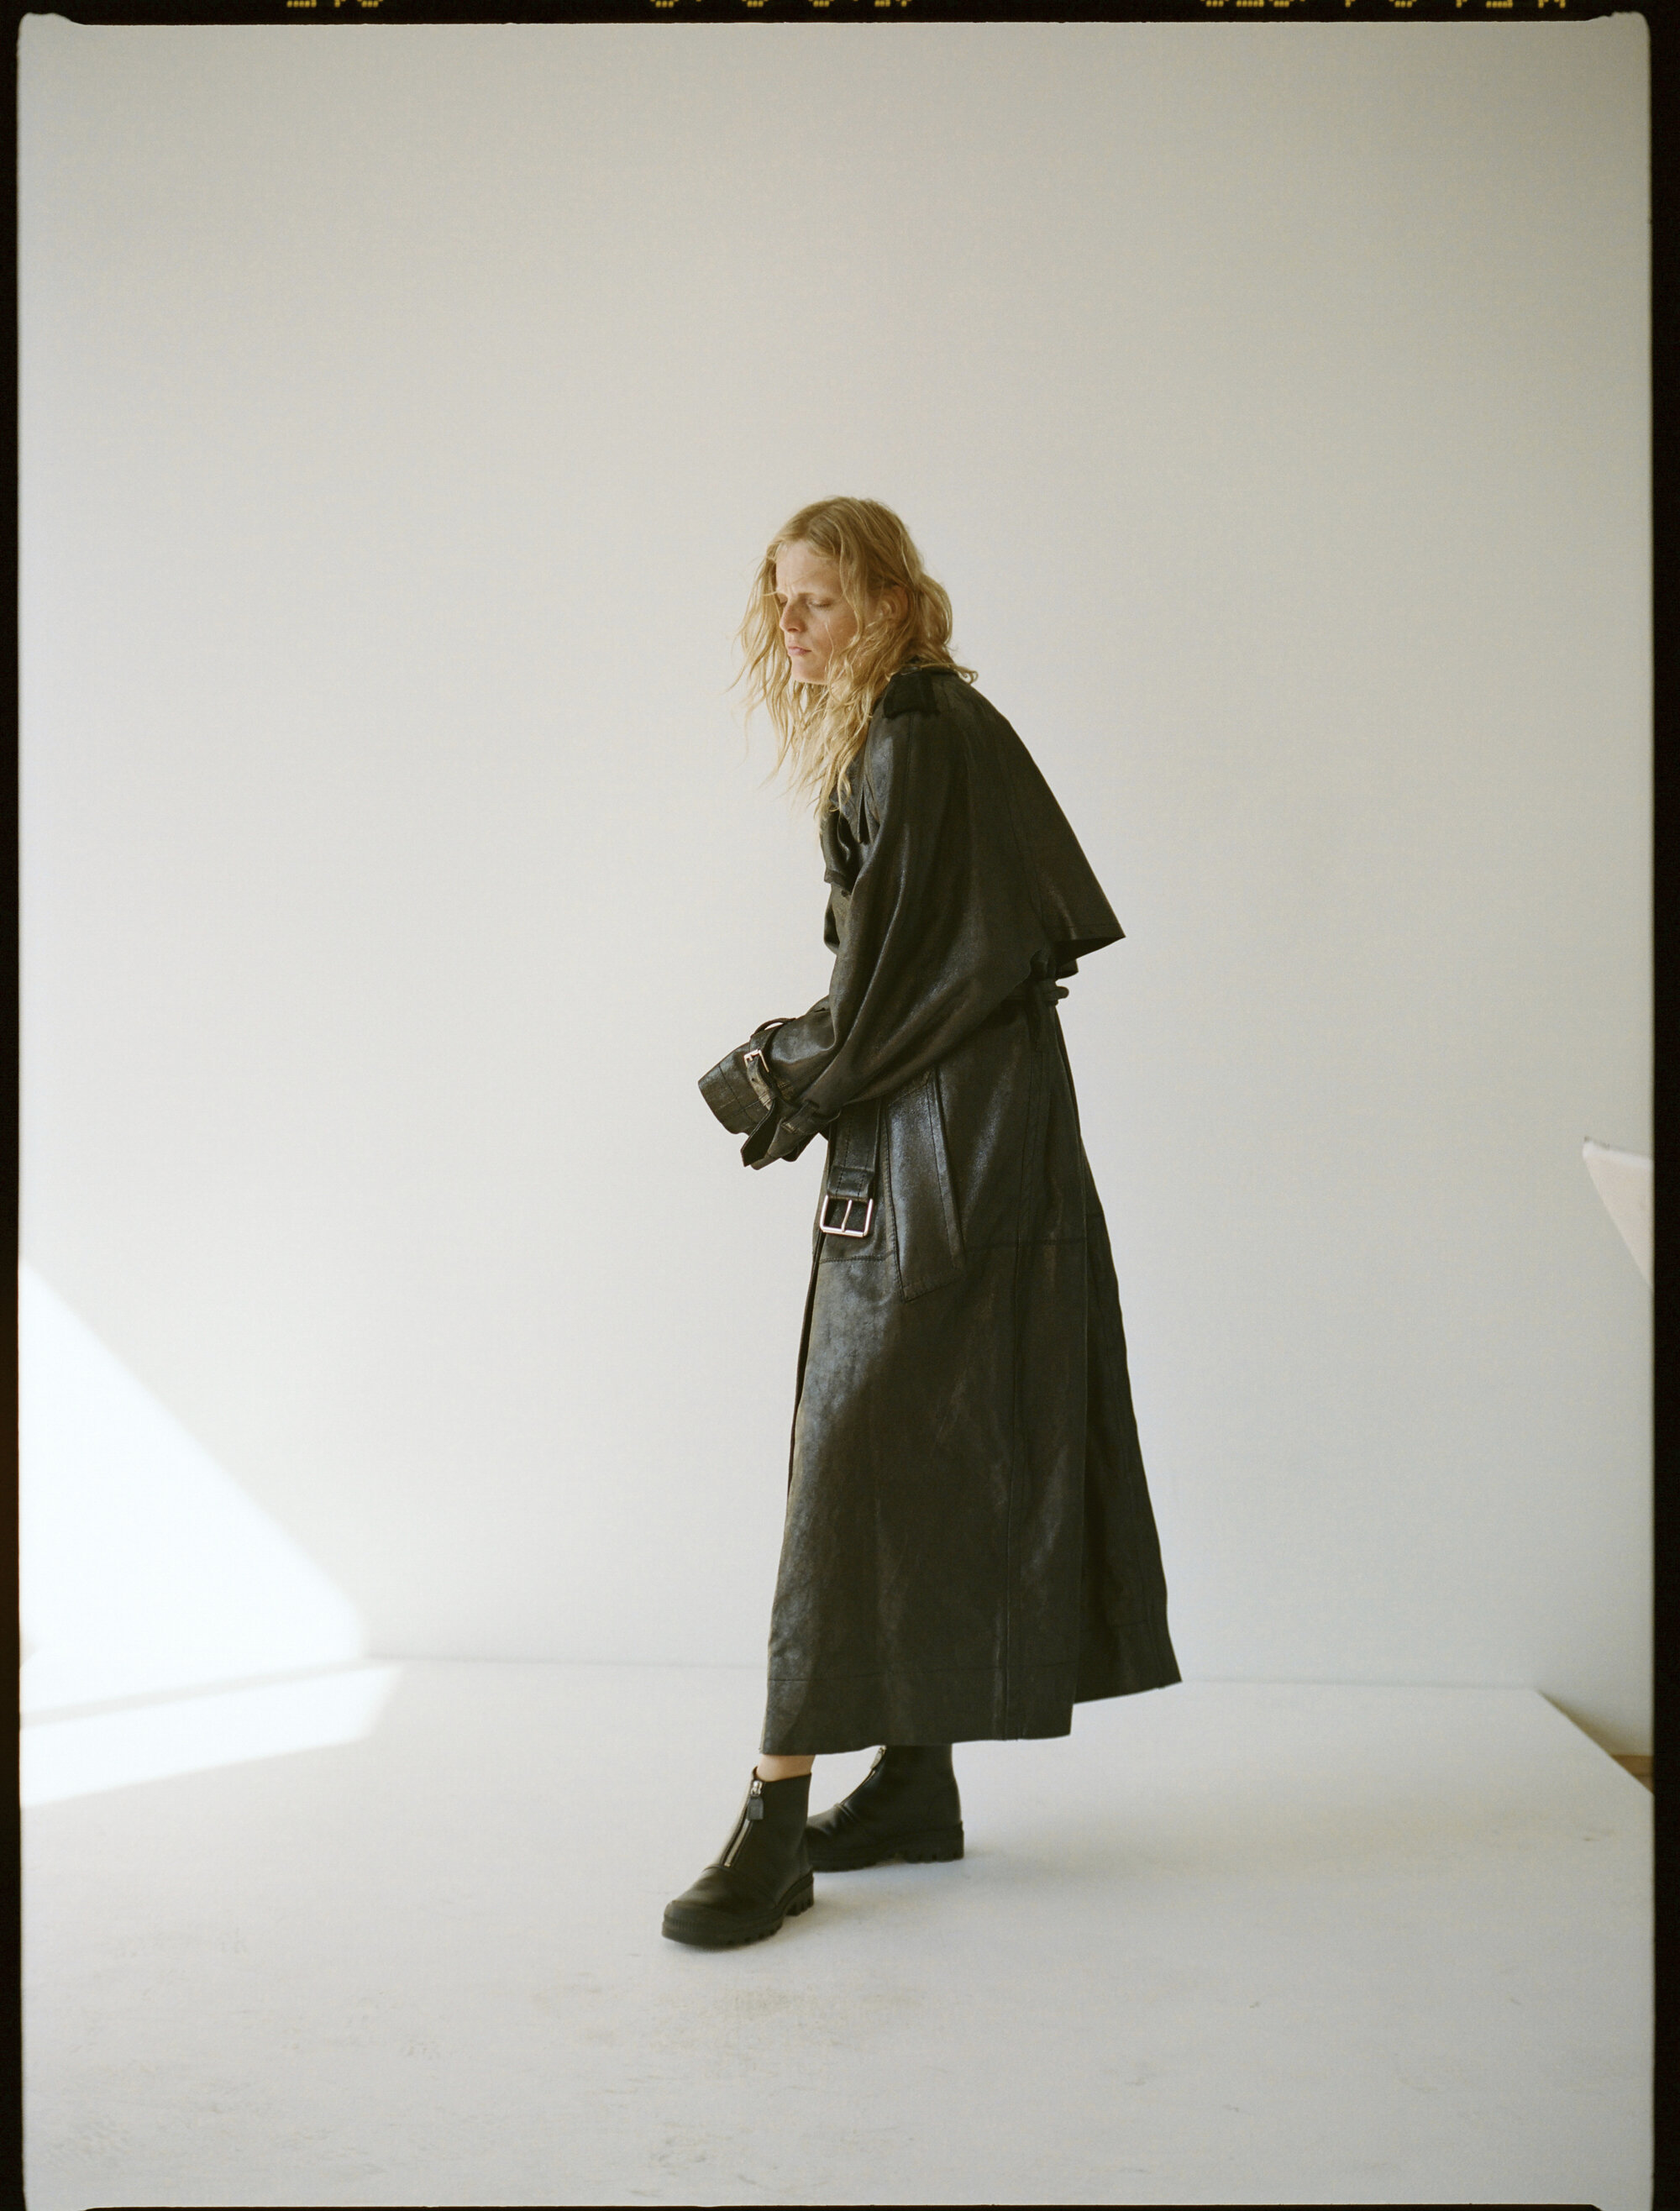 Hanne-Gab-Odiele-by-Mark-Rabadanr-Collection-Issue 4.jpg